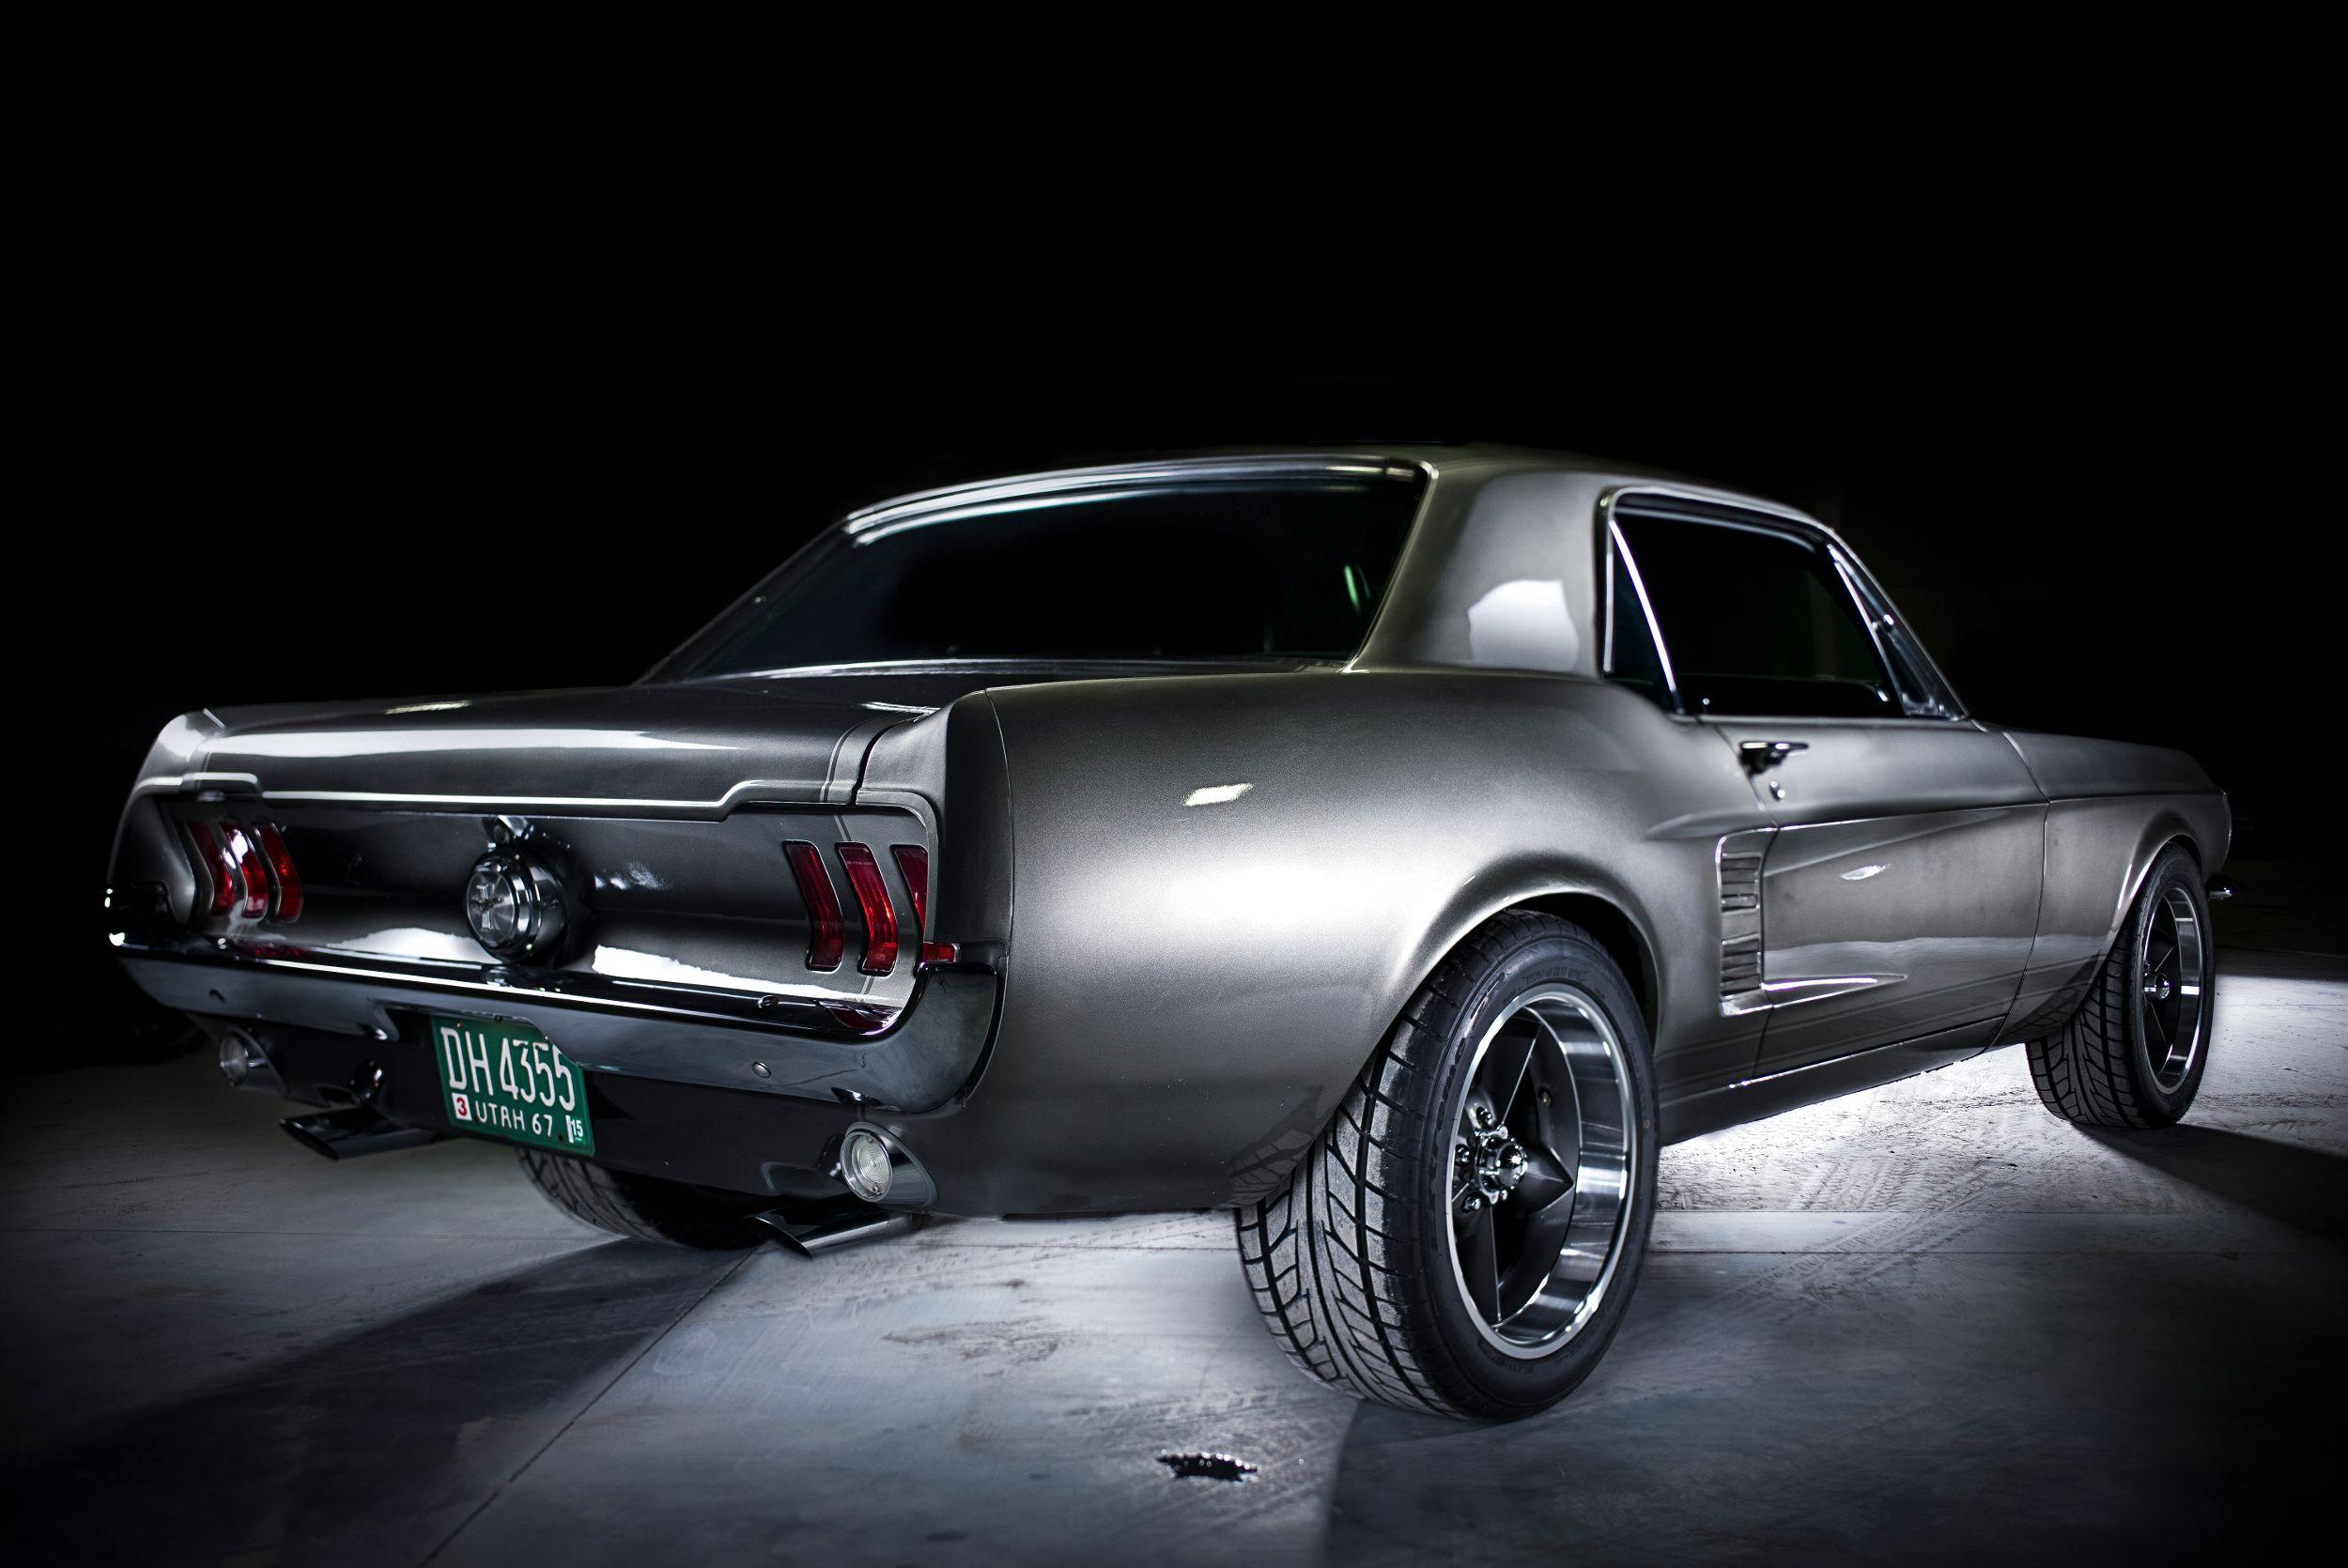 1967 Ford Mustang Classic Mustang Ford Mustang Ford Mustang Wallpaper